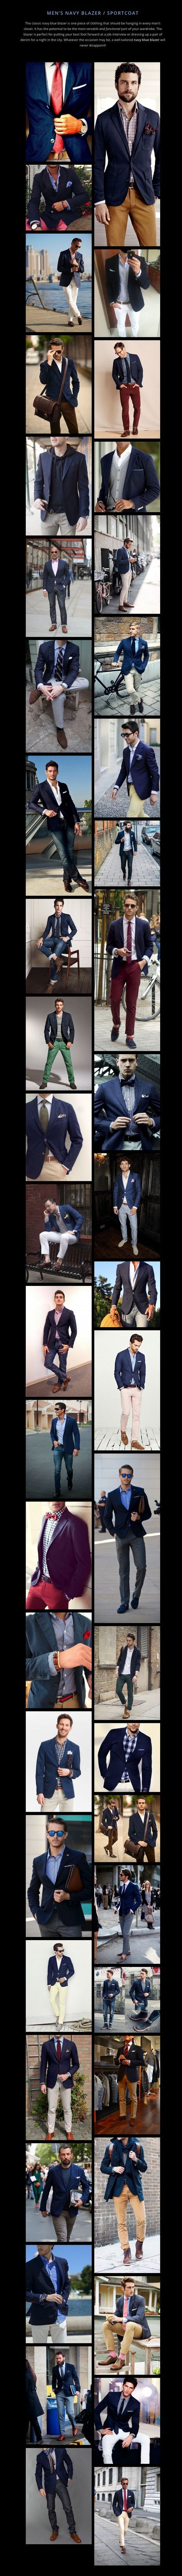 Men's Navy Blazer / Sportcoat http://www.99wtf.net/men/mens-fasion/choose-mens-flannel-shirt/